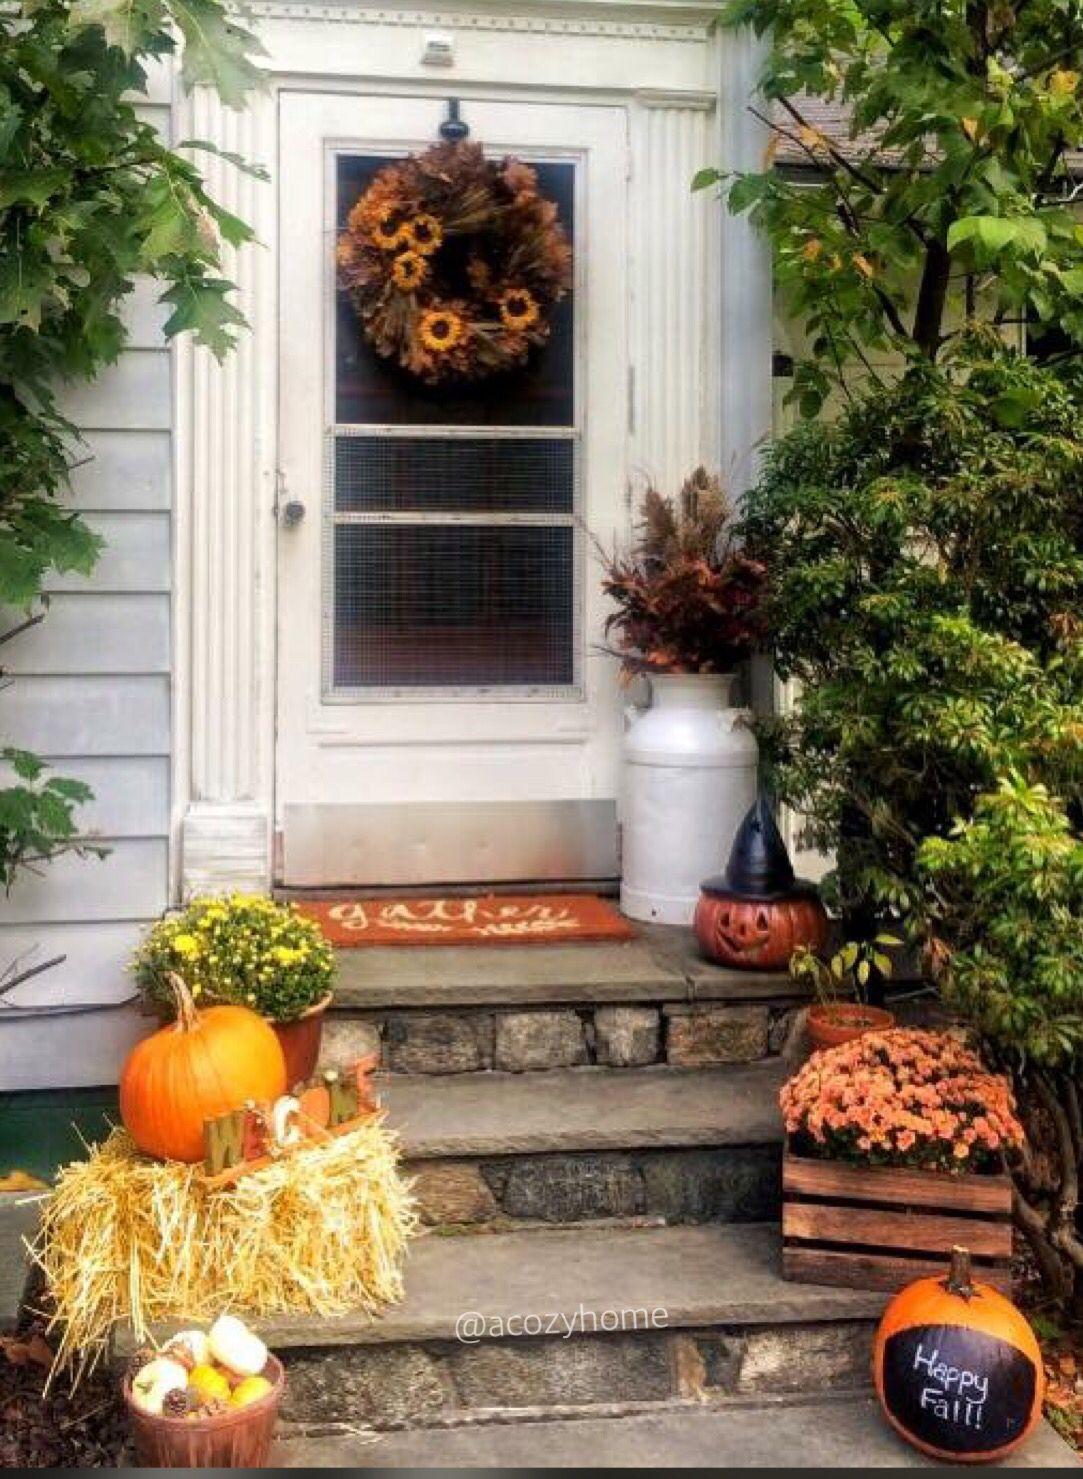 Fall Front Door Decor Entry Way Mums Wreath Welcome Mat Pumpkins Apartment Decor Acozyhome Fall Home Decor Autumn Home Decor